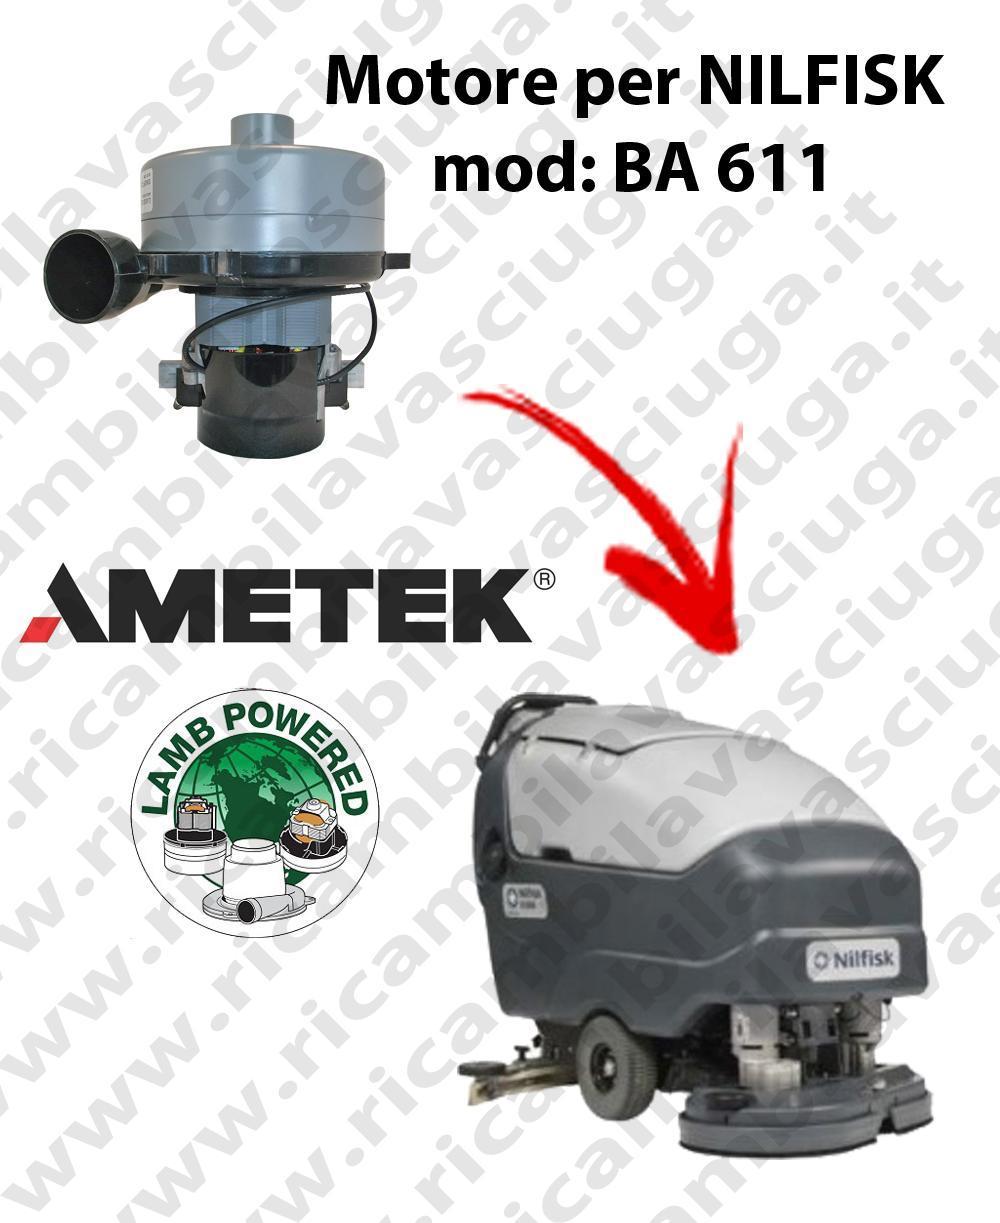 BA 611 Vacuum motor LAMB AMETEK for scrubber dryer NILFISK